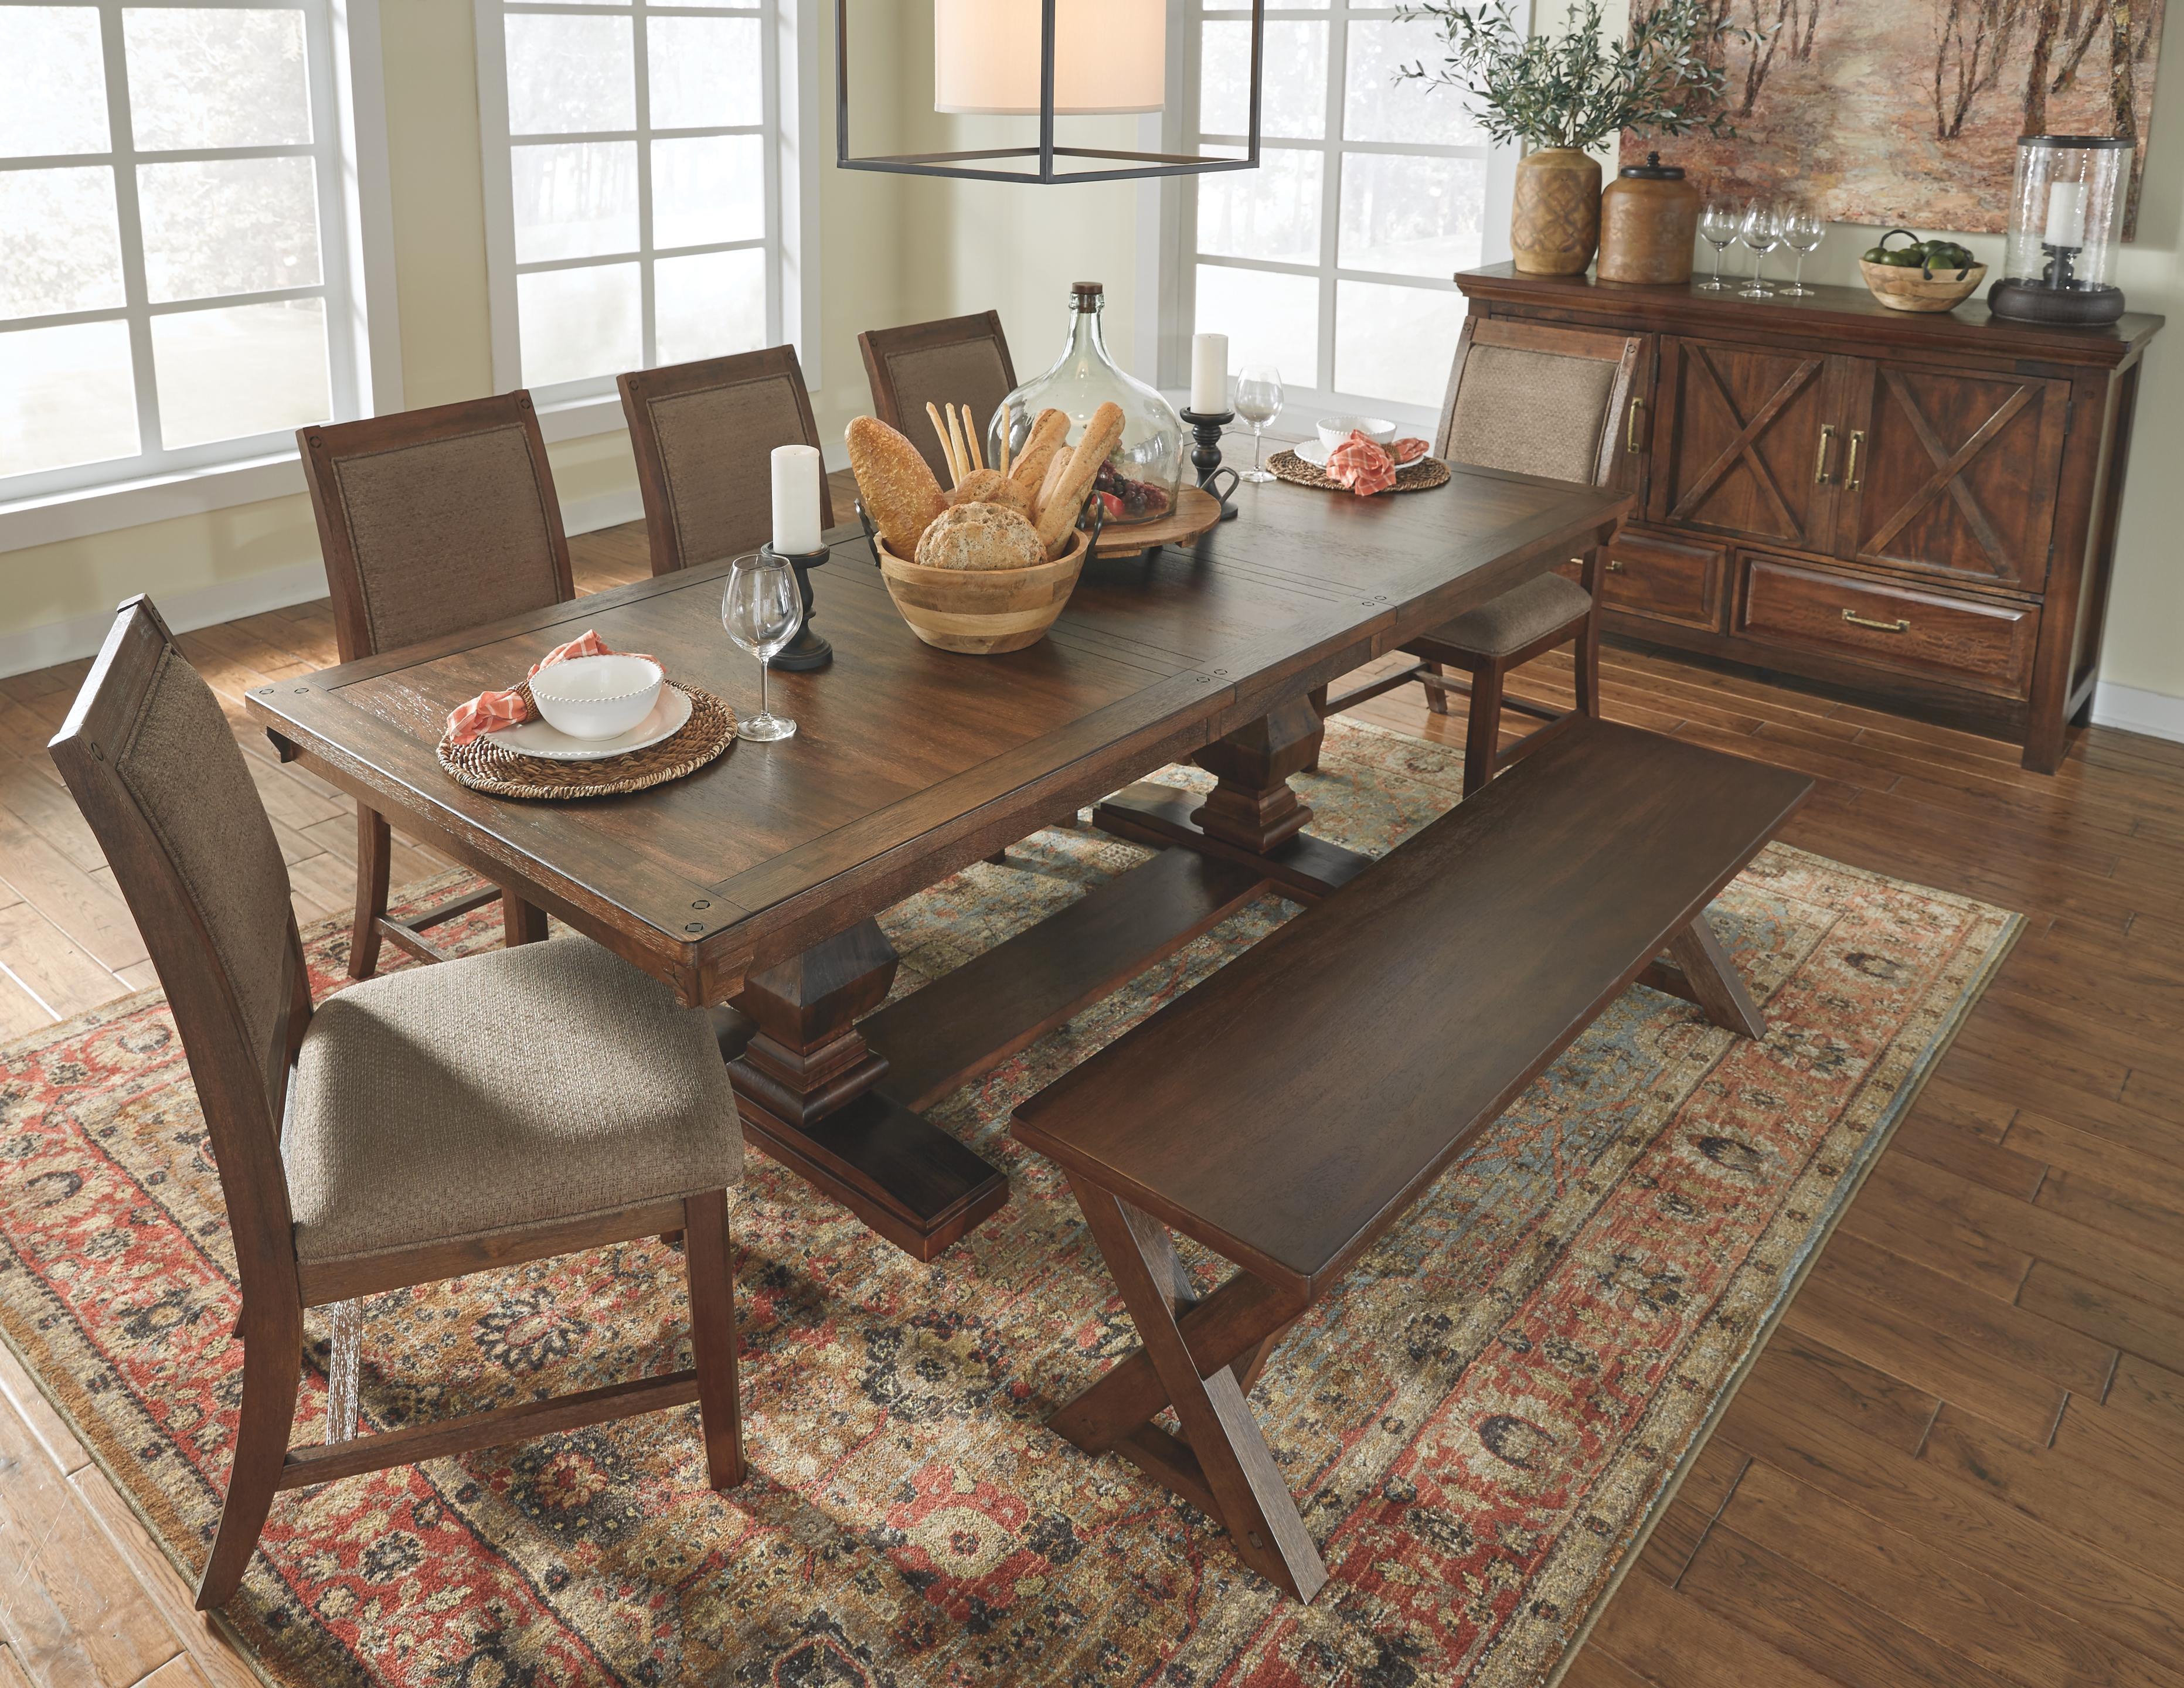 Windville Dining Room Table D662d4 By, Windville Dining Room Set